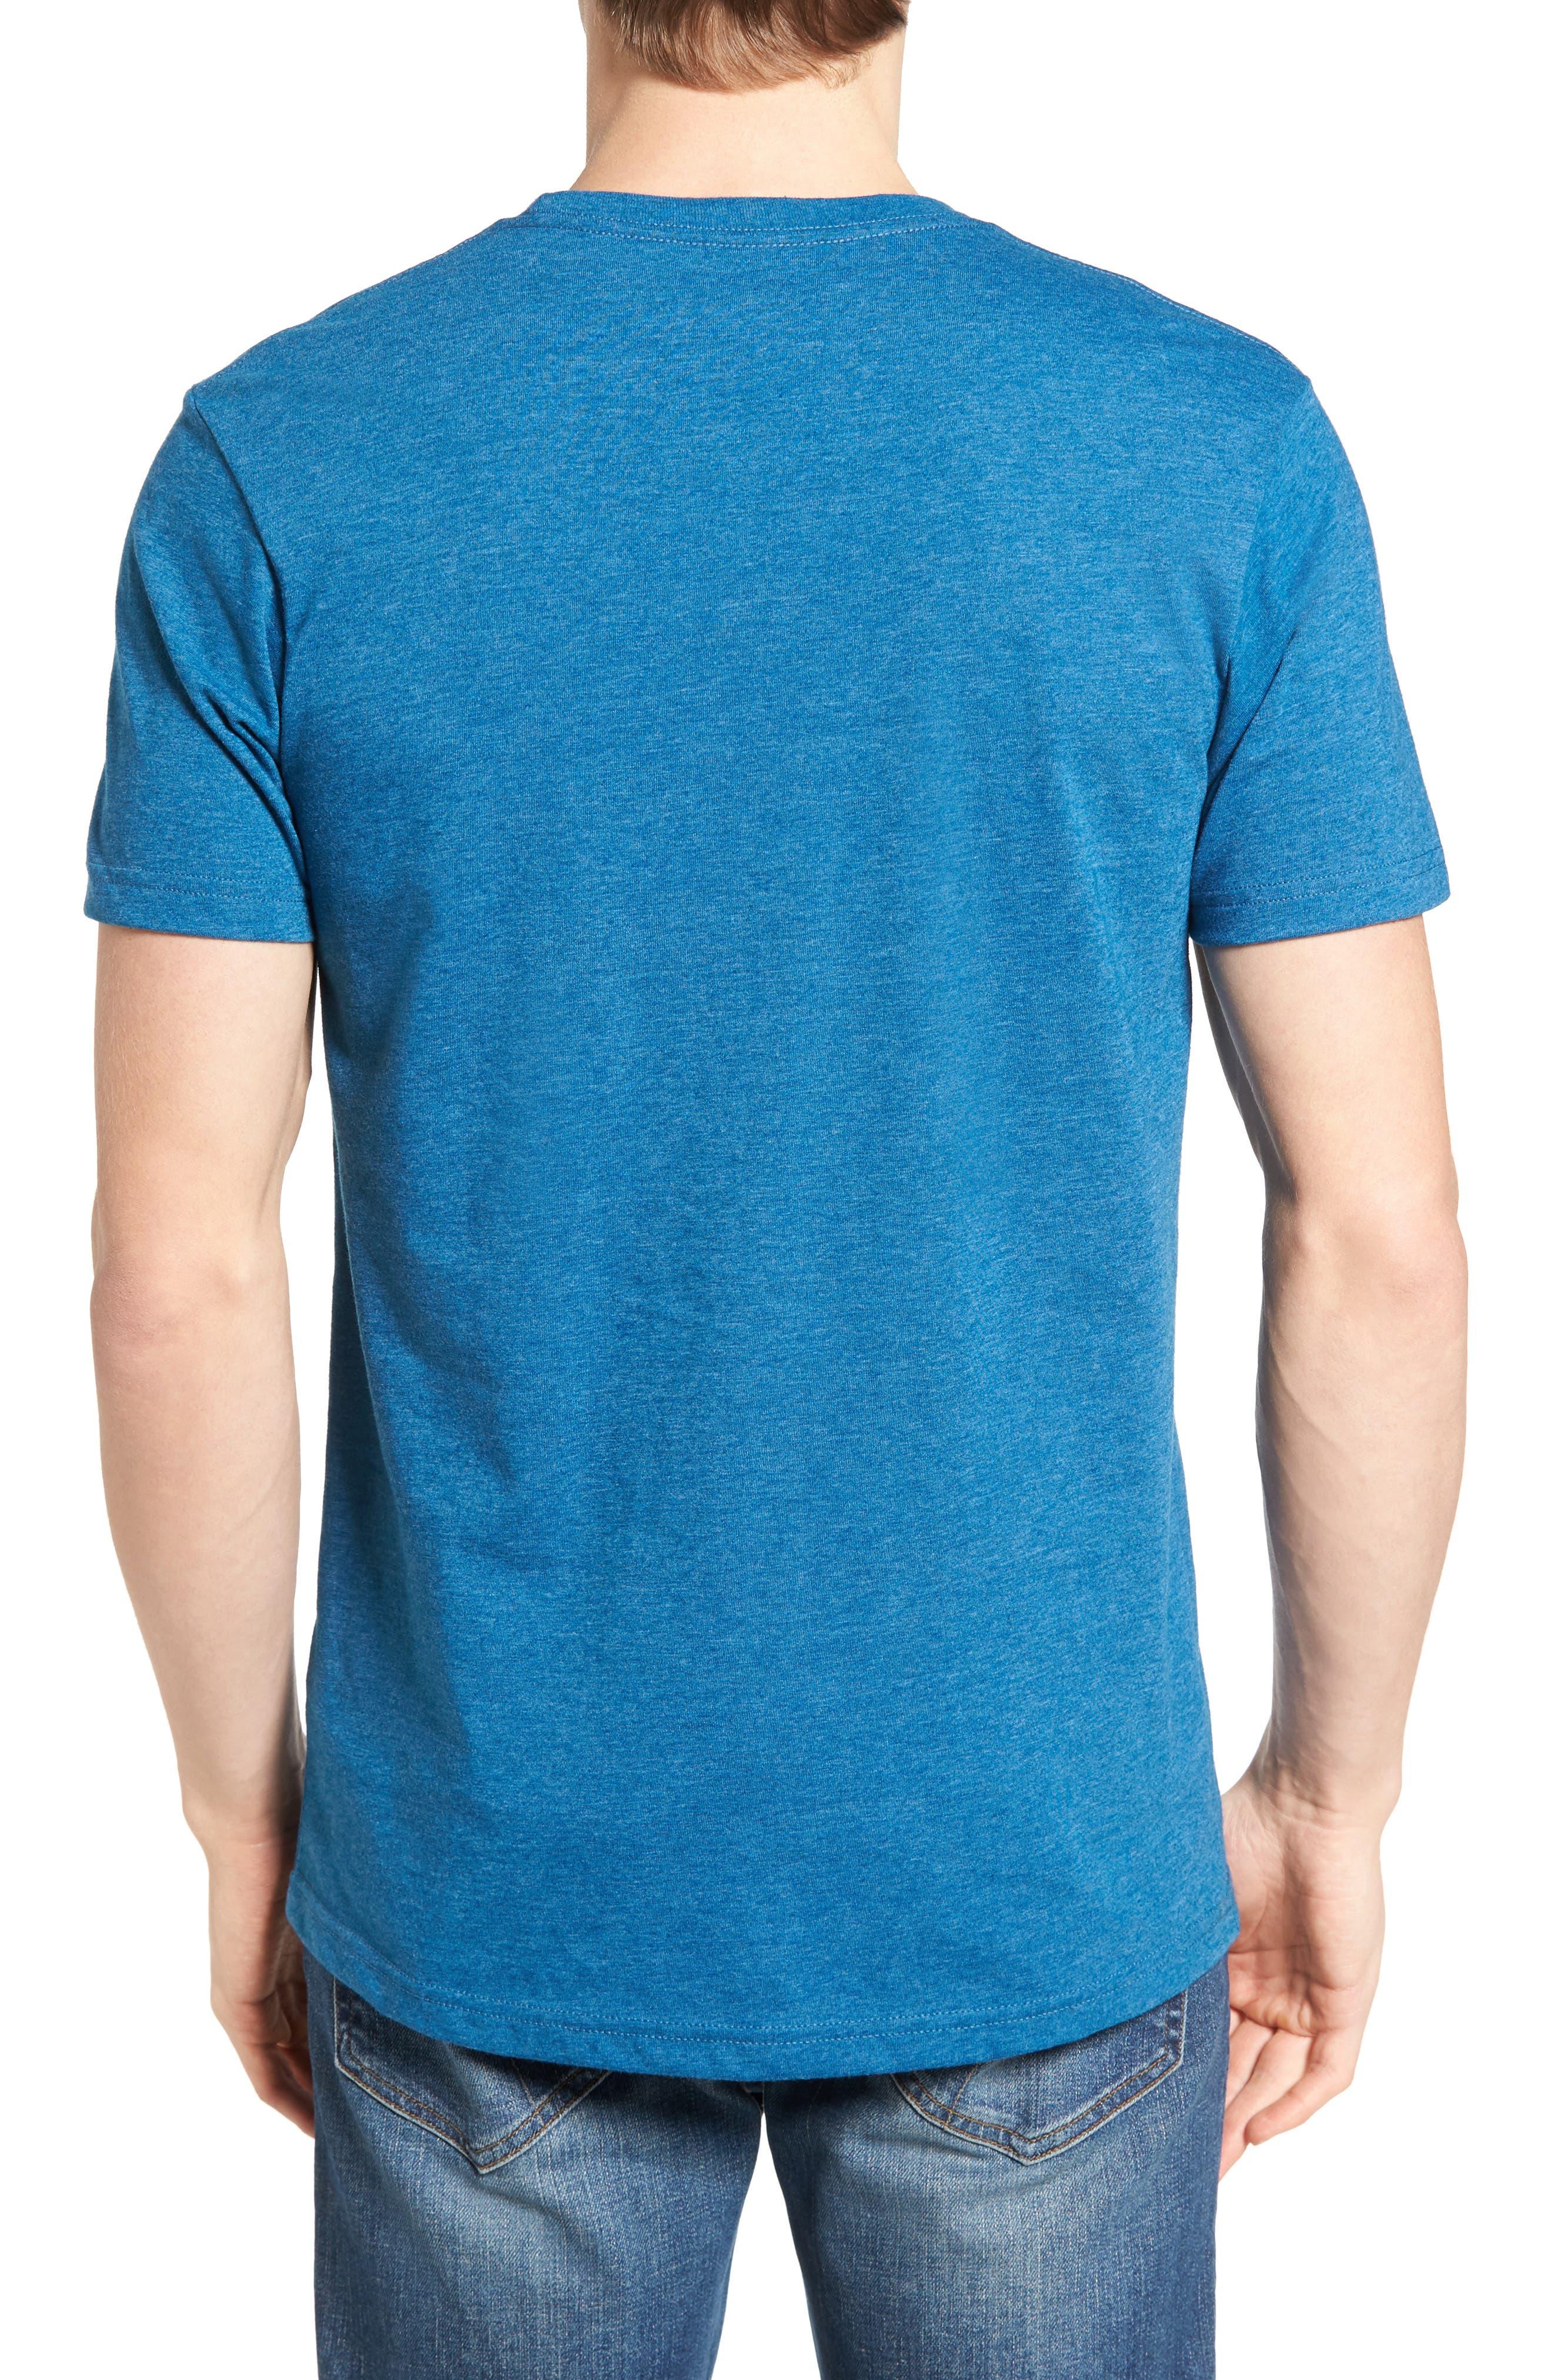 Alternate Image 2  - Patagonia Board Short Label T-Shirt